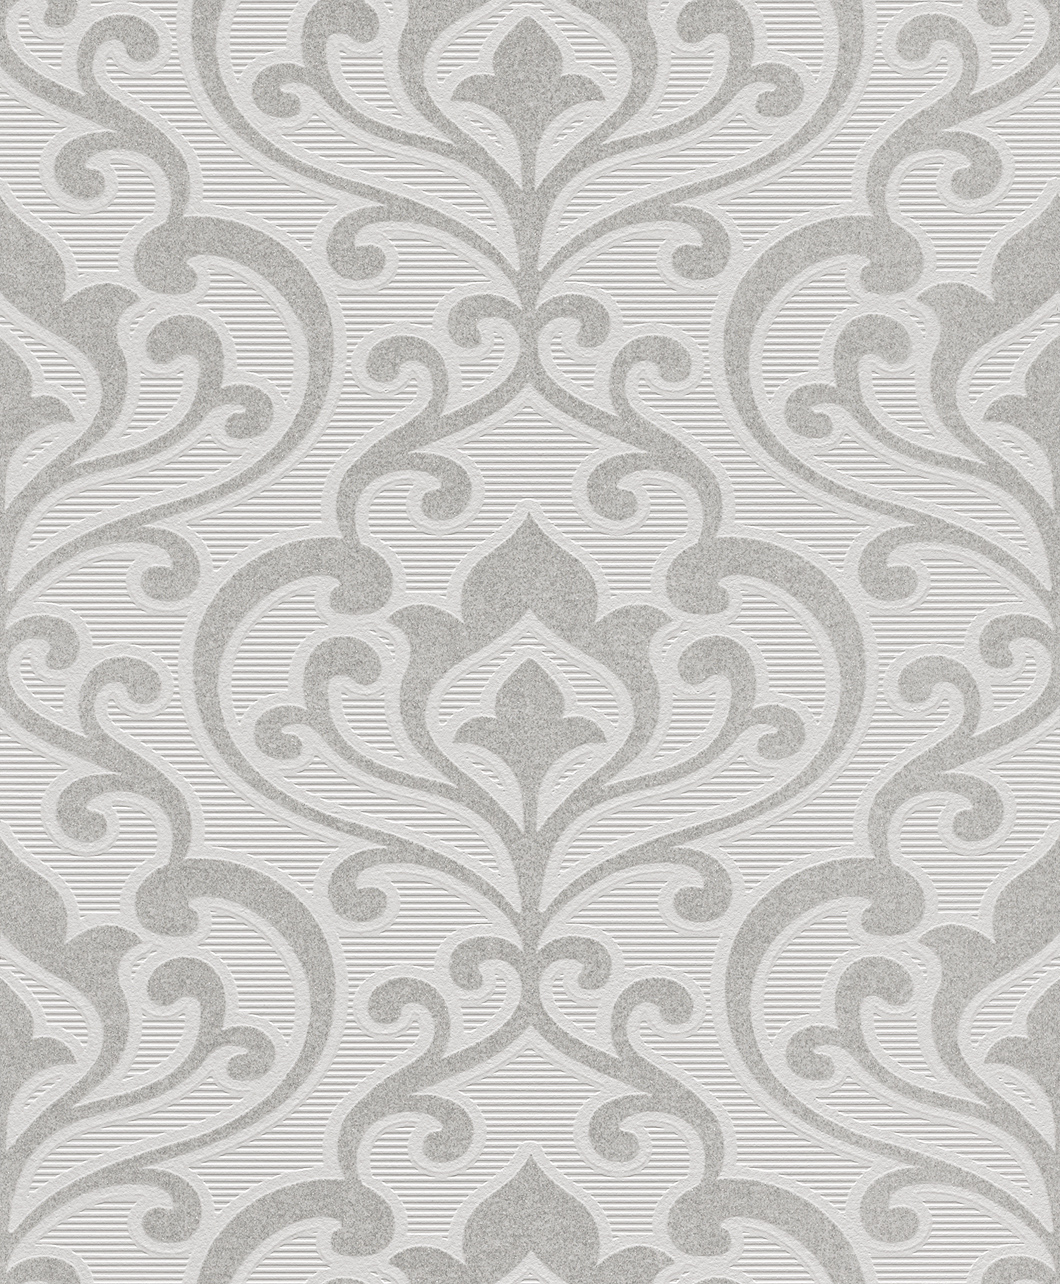 rasch tapeten queens 2013 795004 vlies 2 62 m ebay. Black Bedroom Furniture Sets. Home Design Ideas